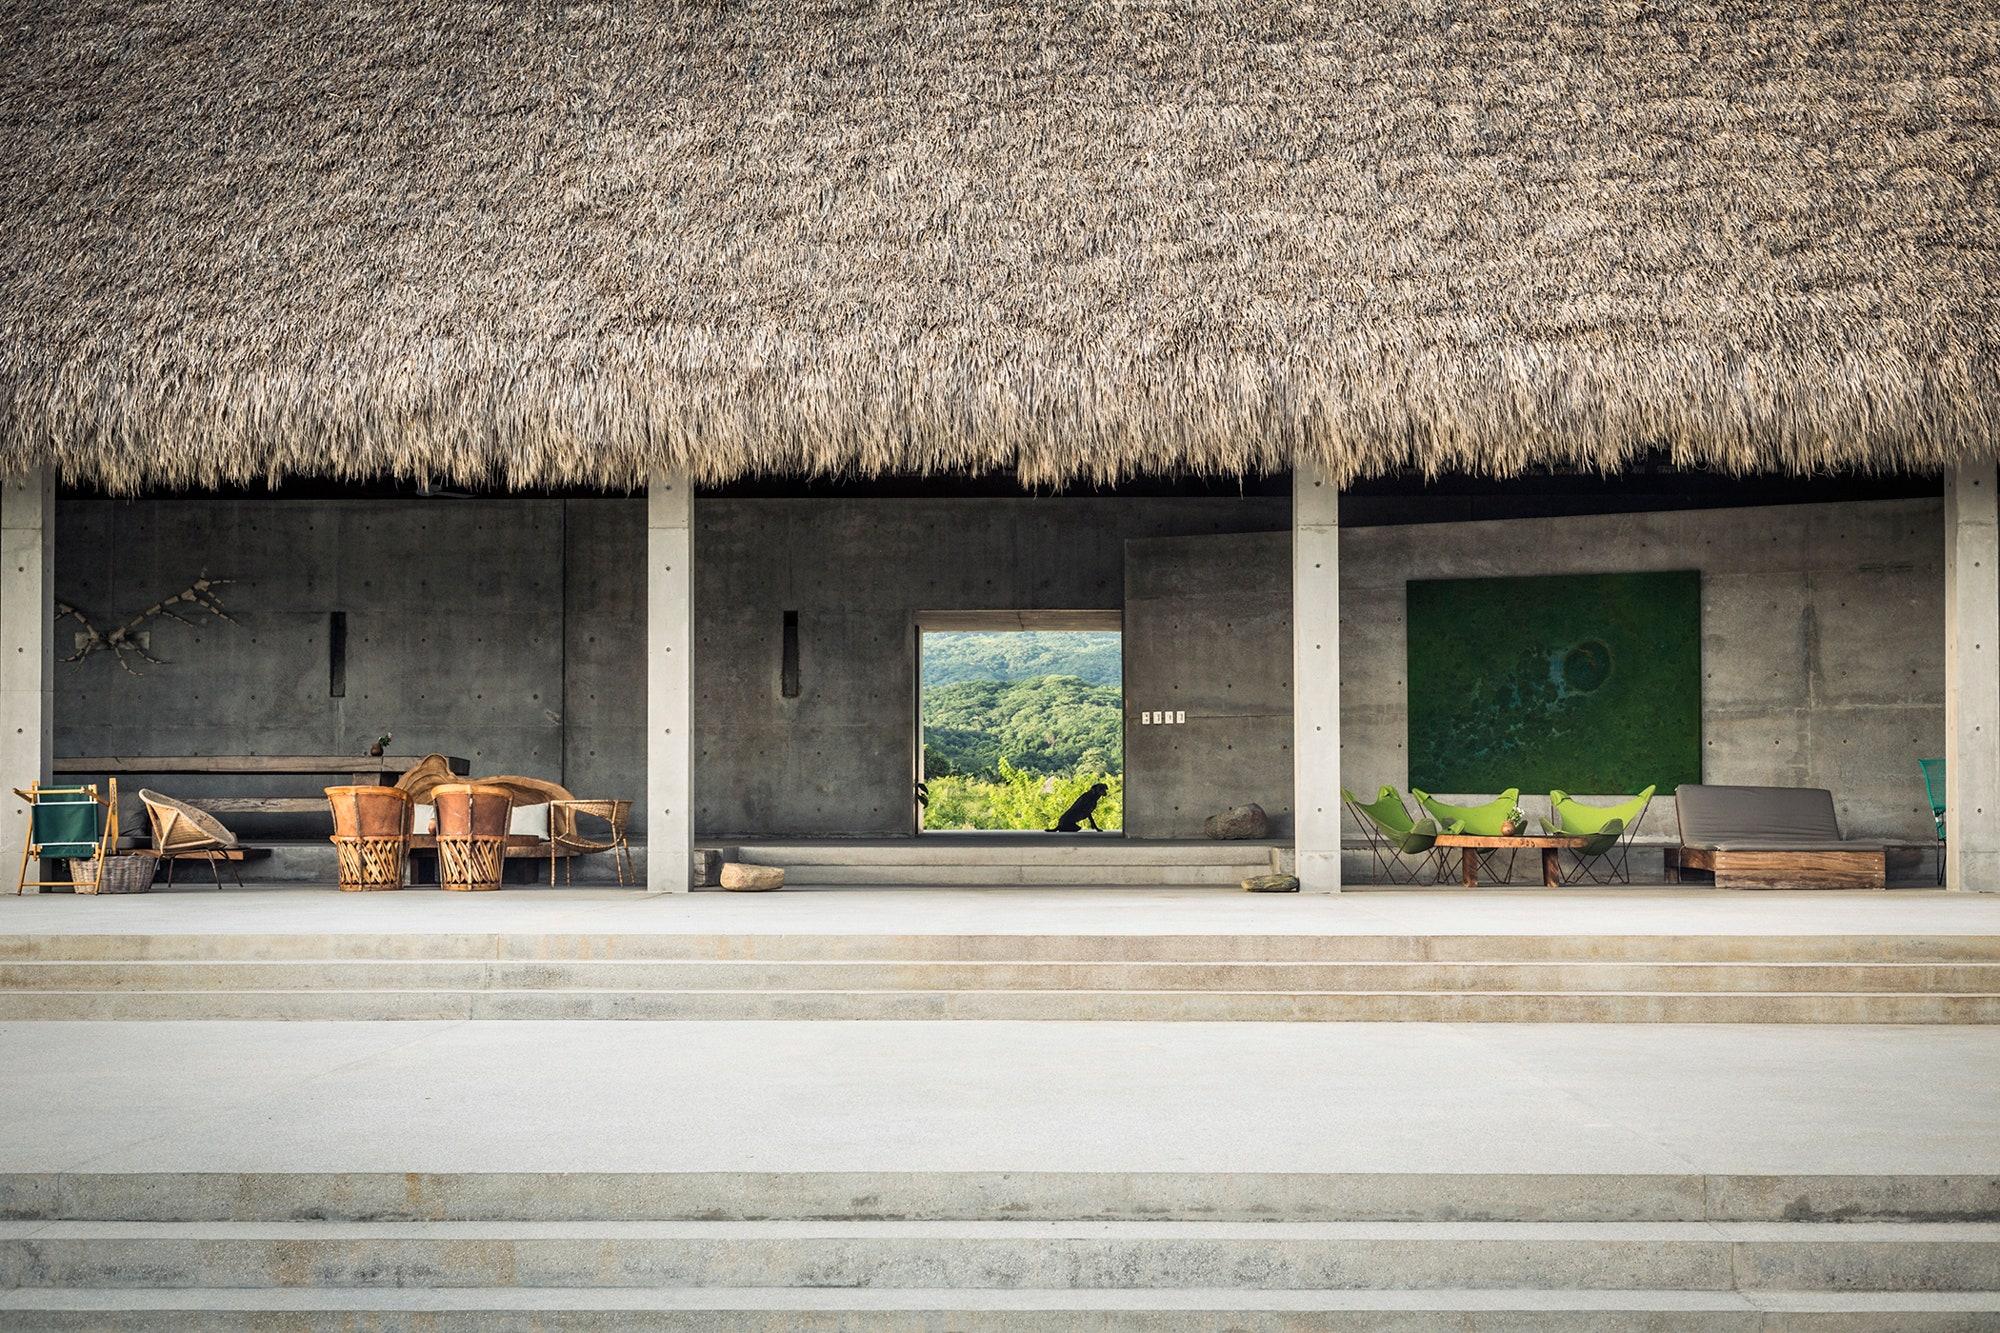 The exterior of Casa Wabi